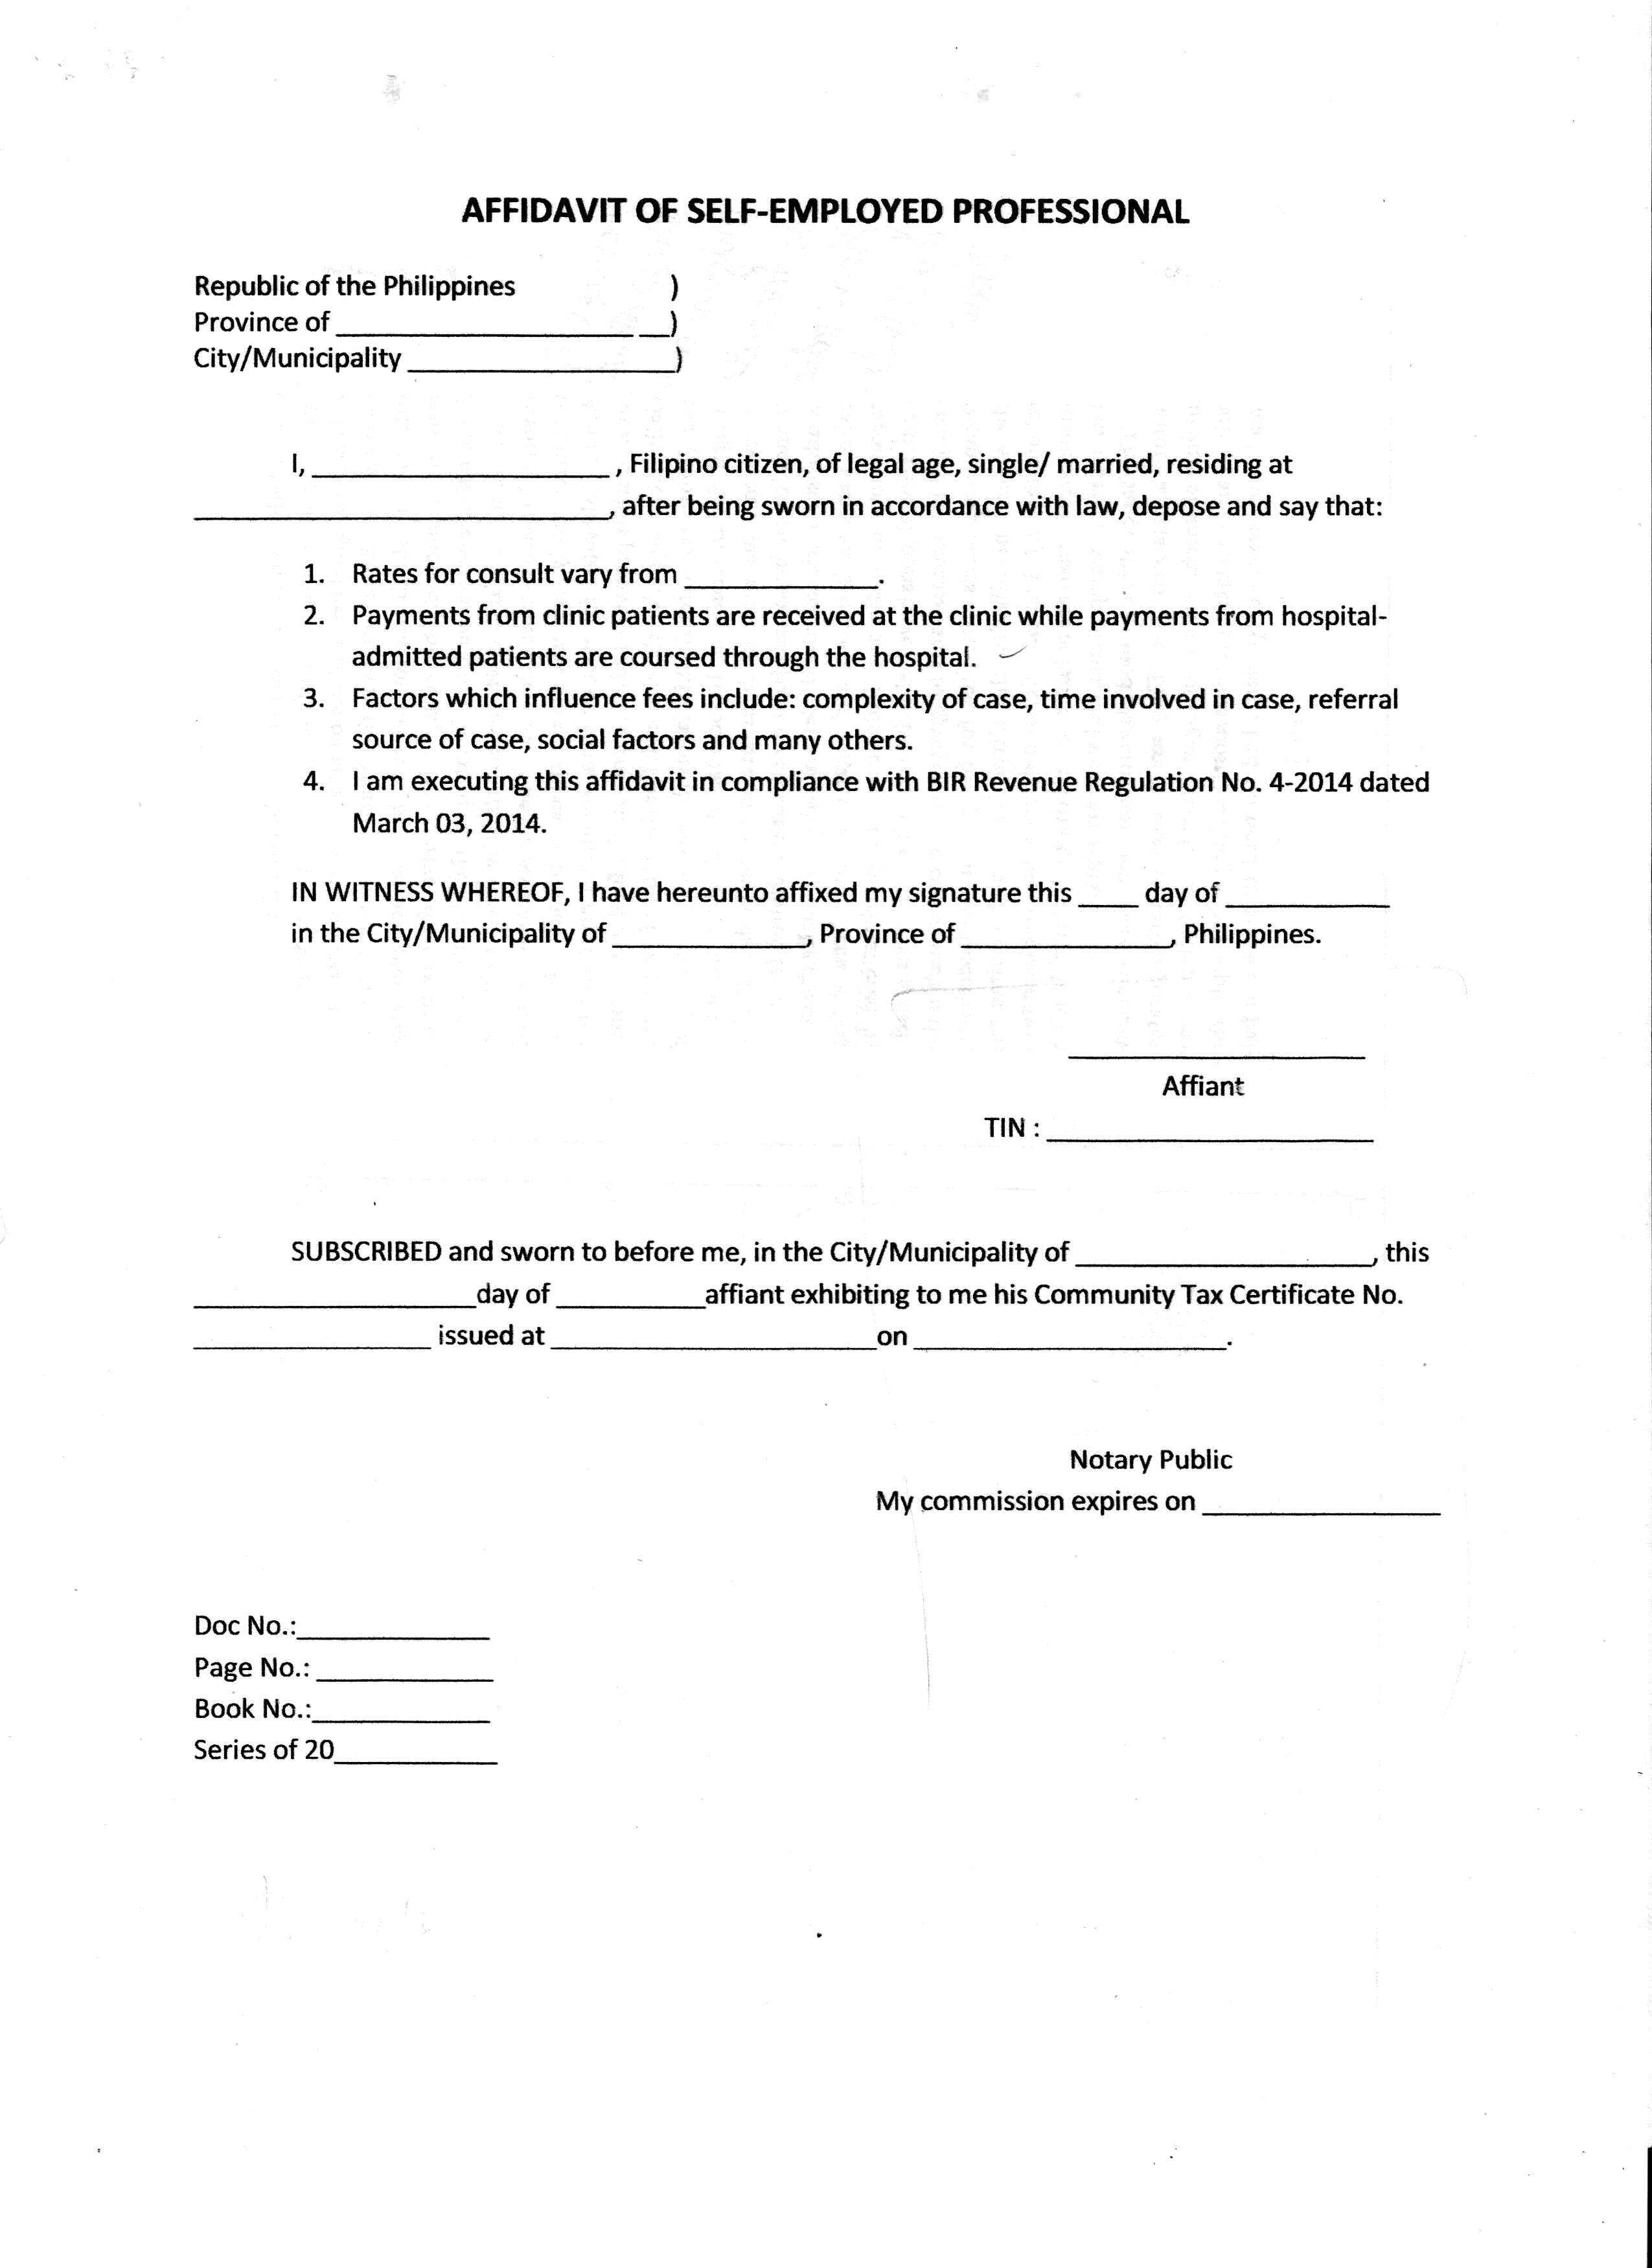 Affidavits Template affidavit template affidavit for self – Affidavits Template